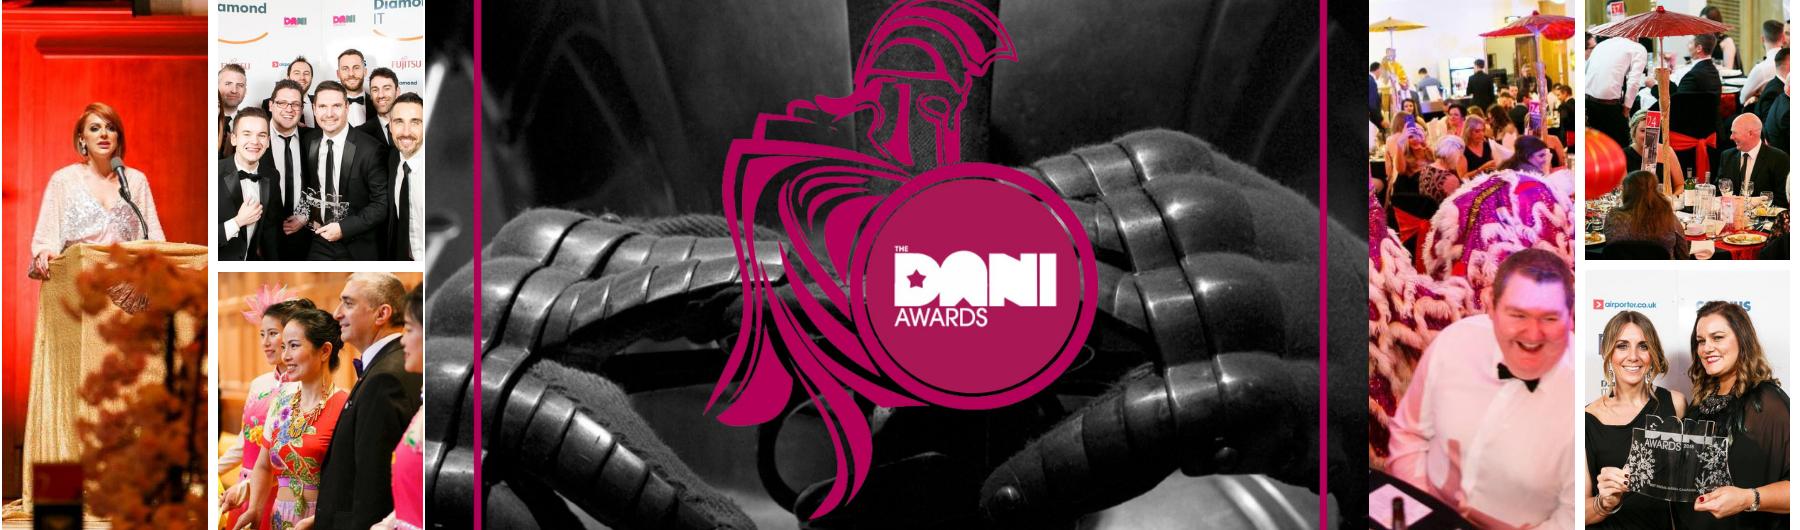 DANI Awards 2019